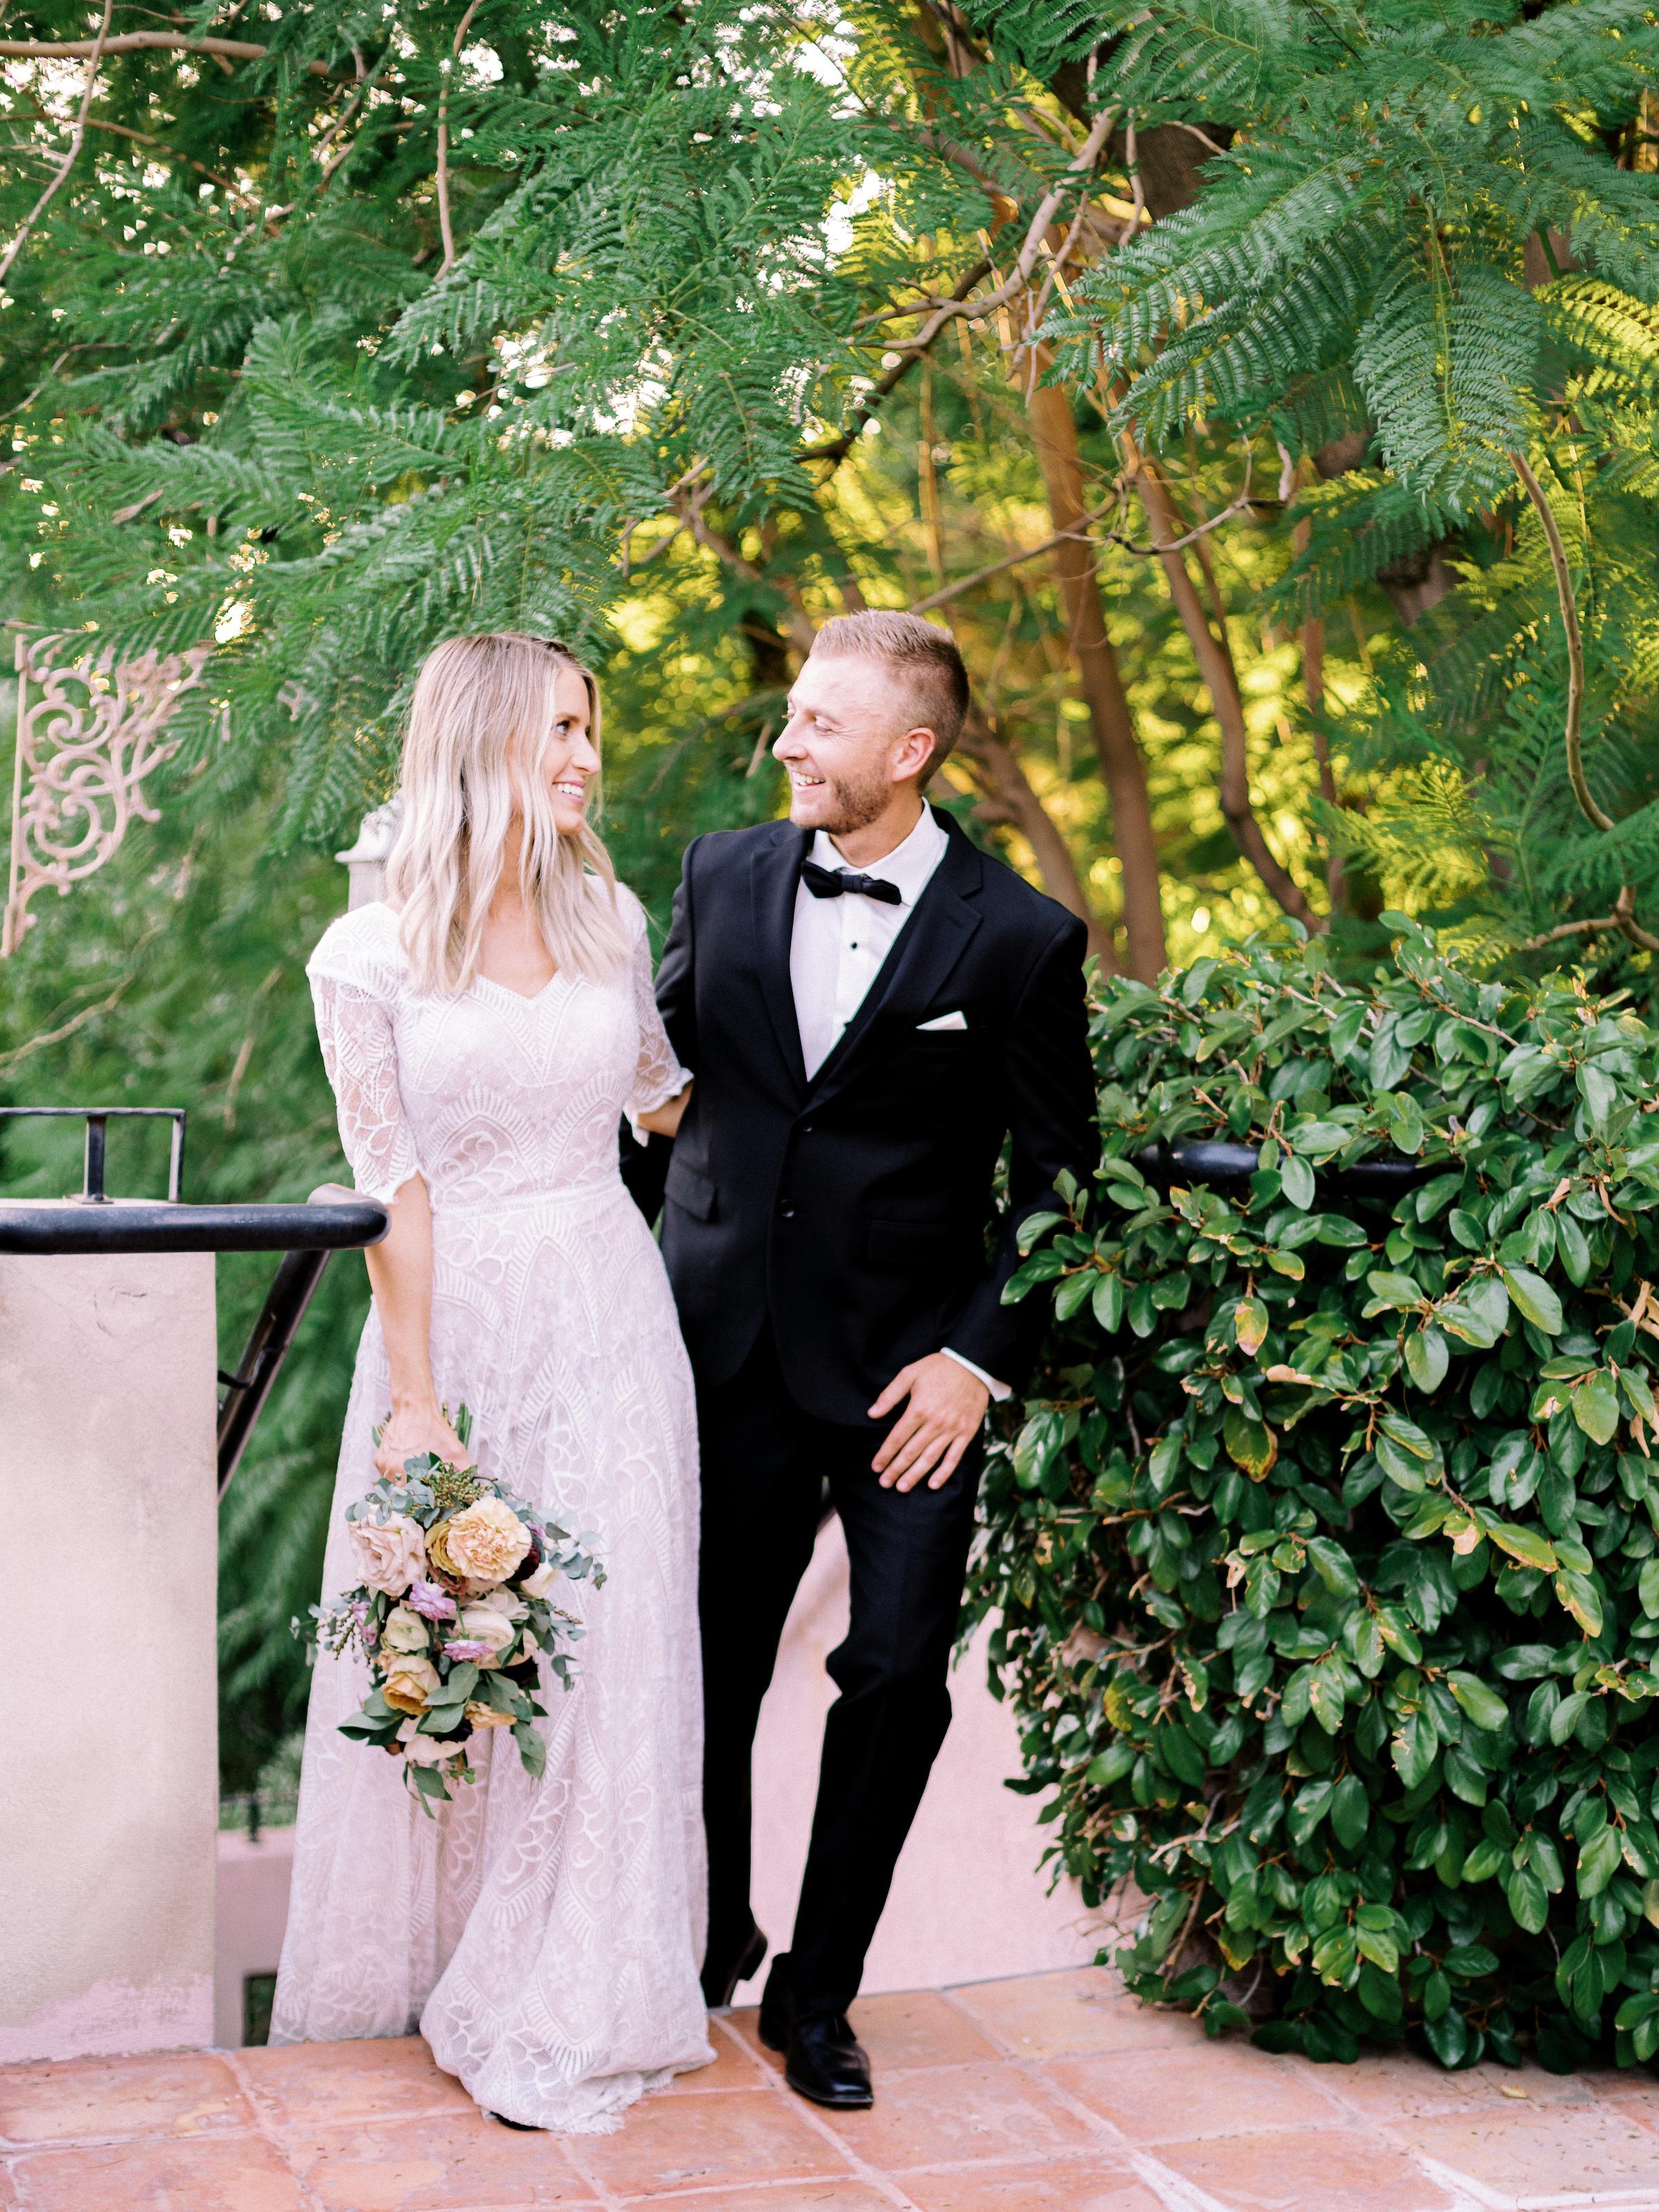 Boho Chic Wedding Dress Long Sleeve Romantic Roses Wright House Truth And Beauty Photography